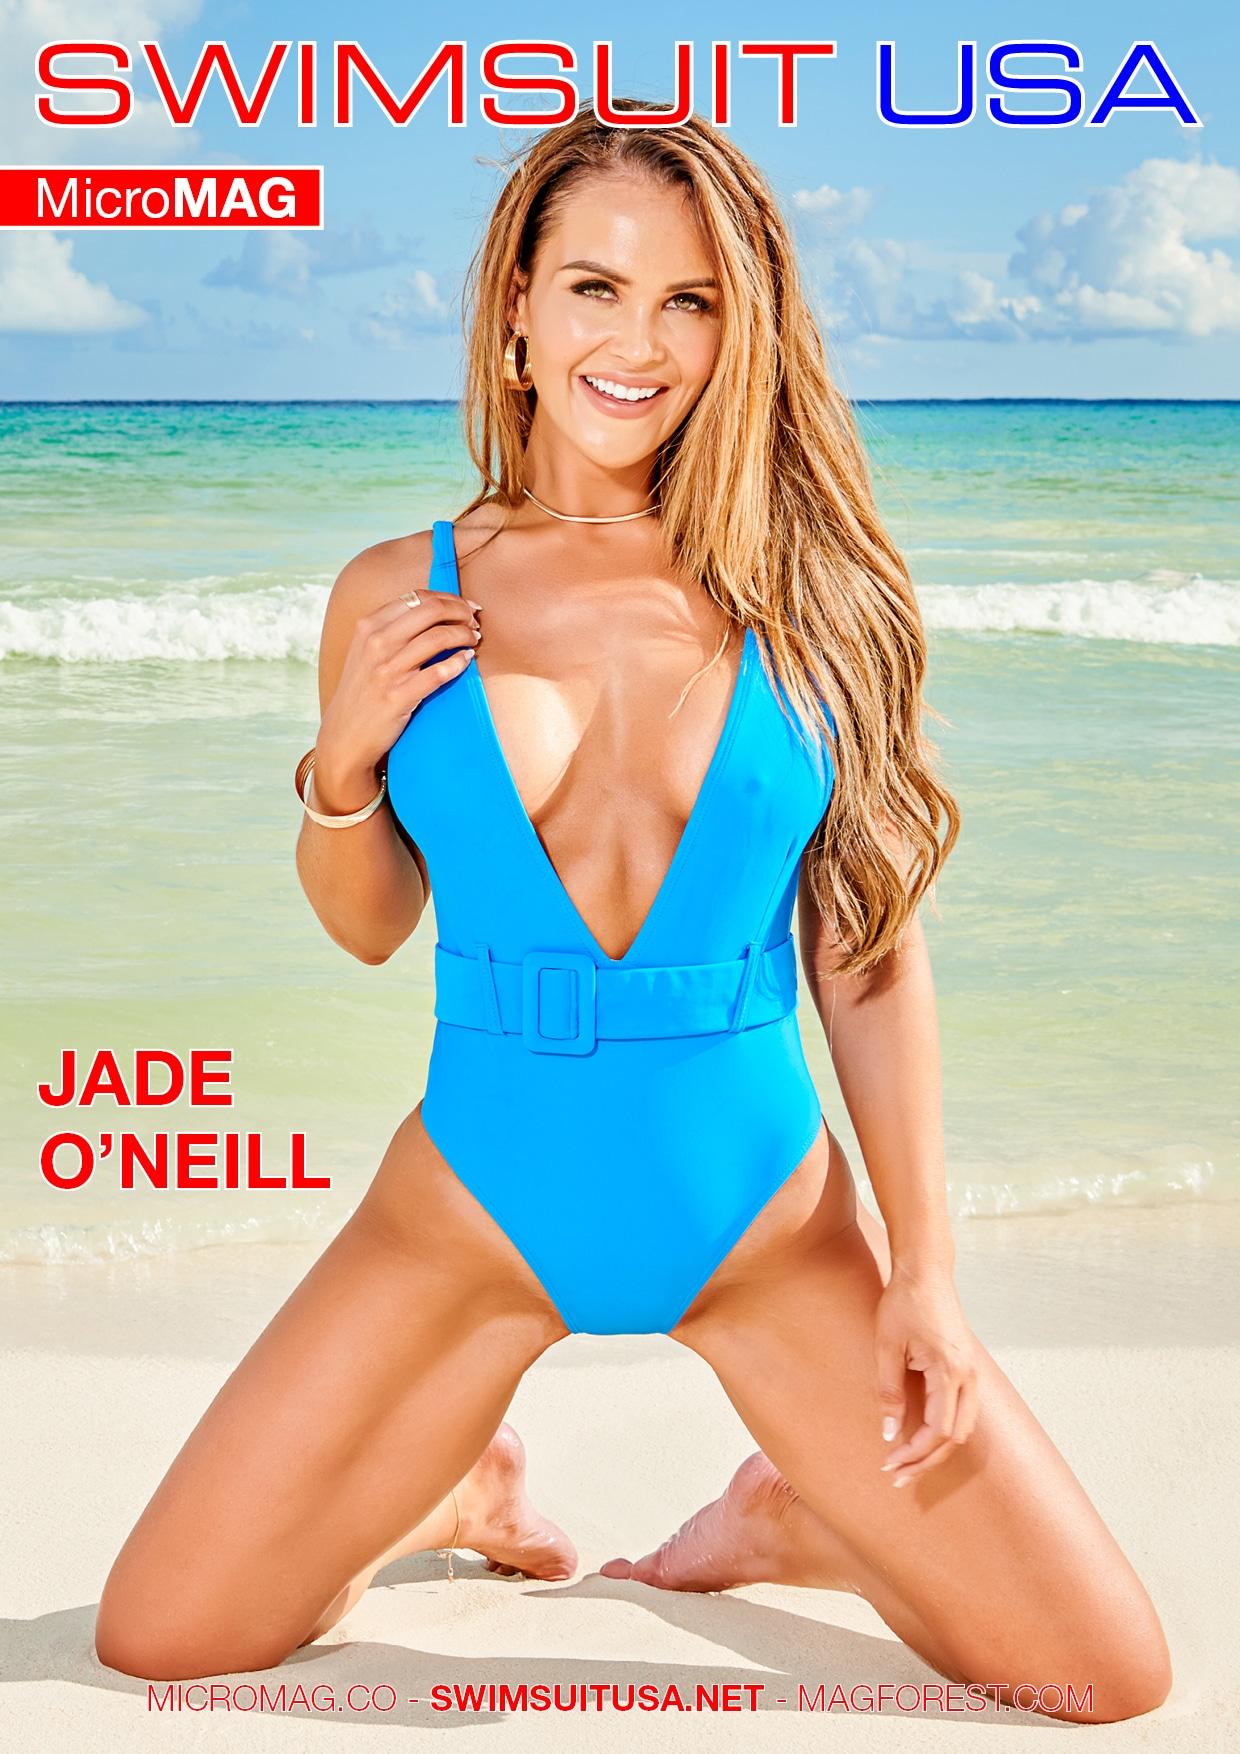 Swimsuit USA MicroMAG - Jade O'Neill 2